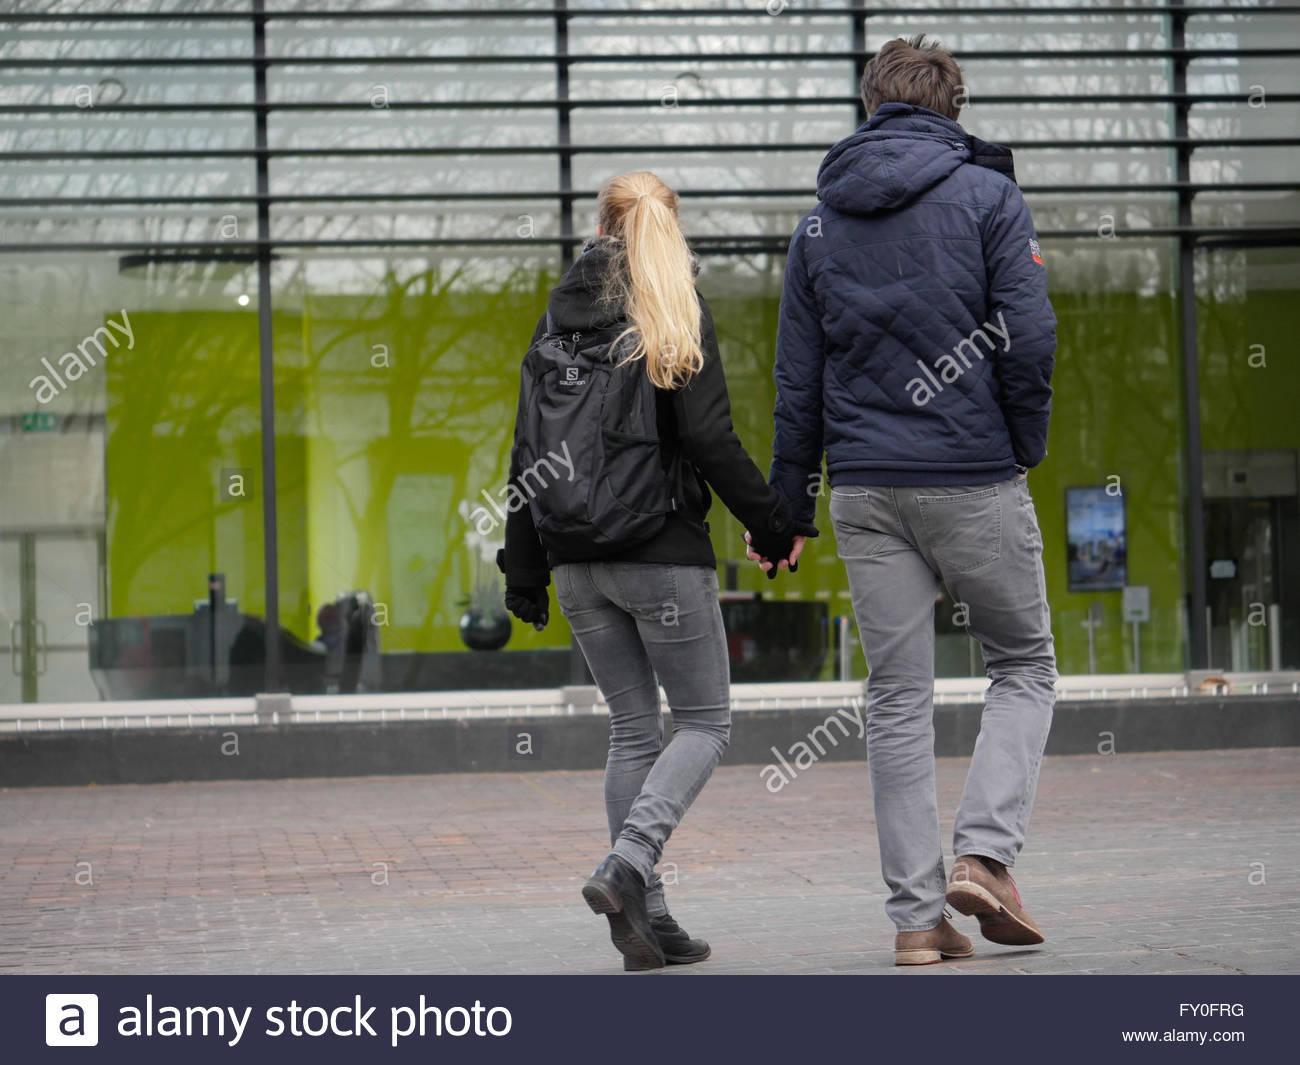 A couple taking a walk in Greenwich.London UKA couple taking a walk in London UK - Stock Image